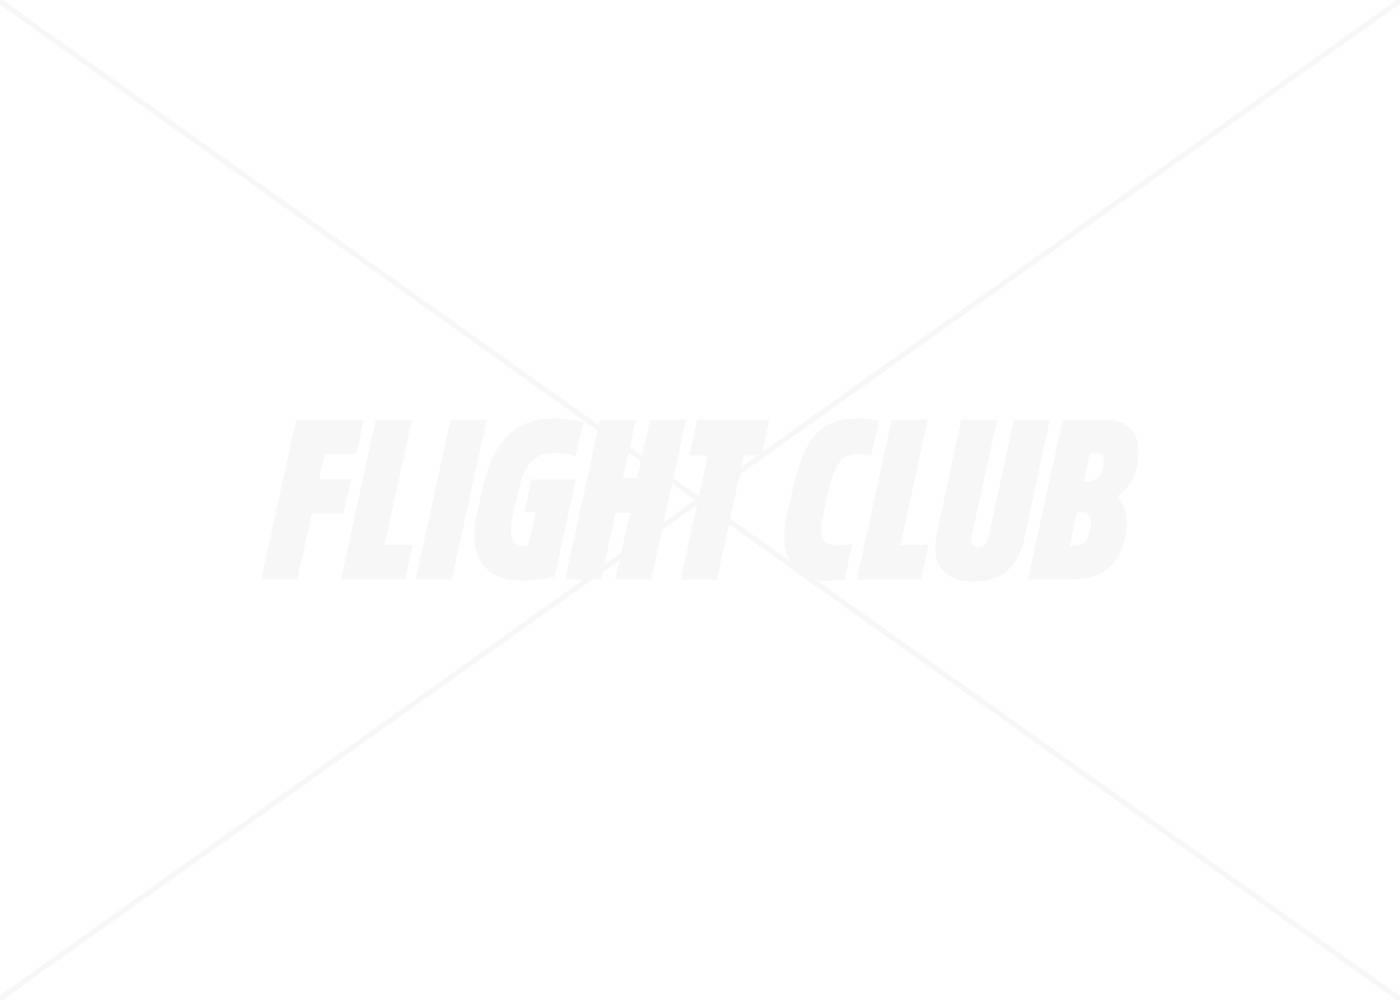 Nike air force 1 mid premium thanksgiving sold out - Air Jordan 1 Retro High Og Top 3